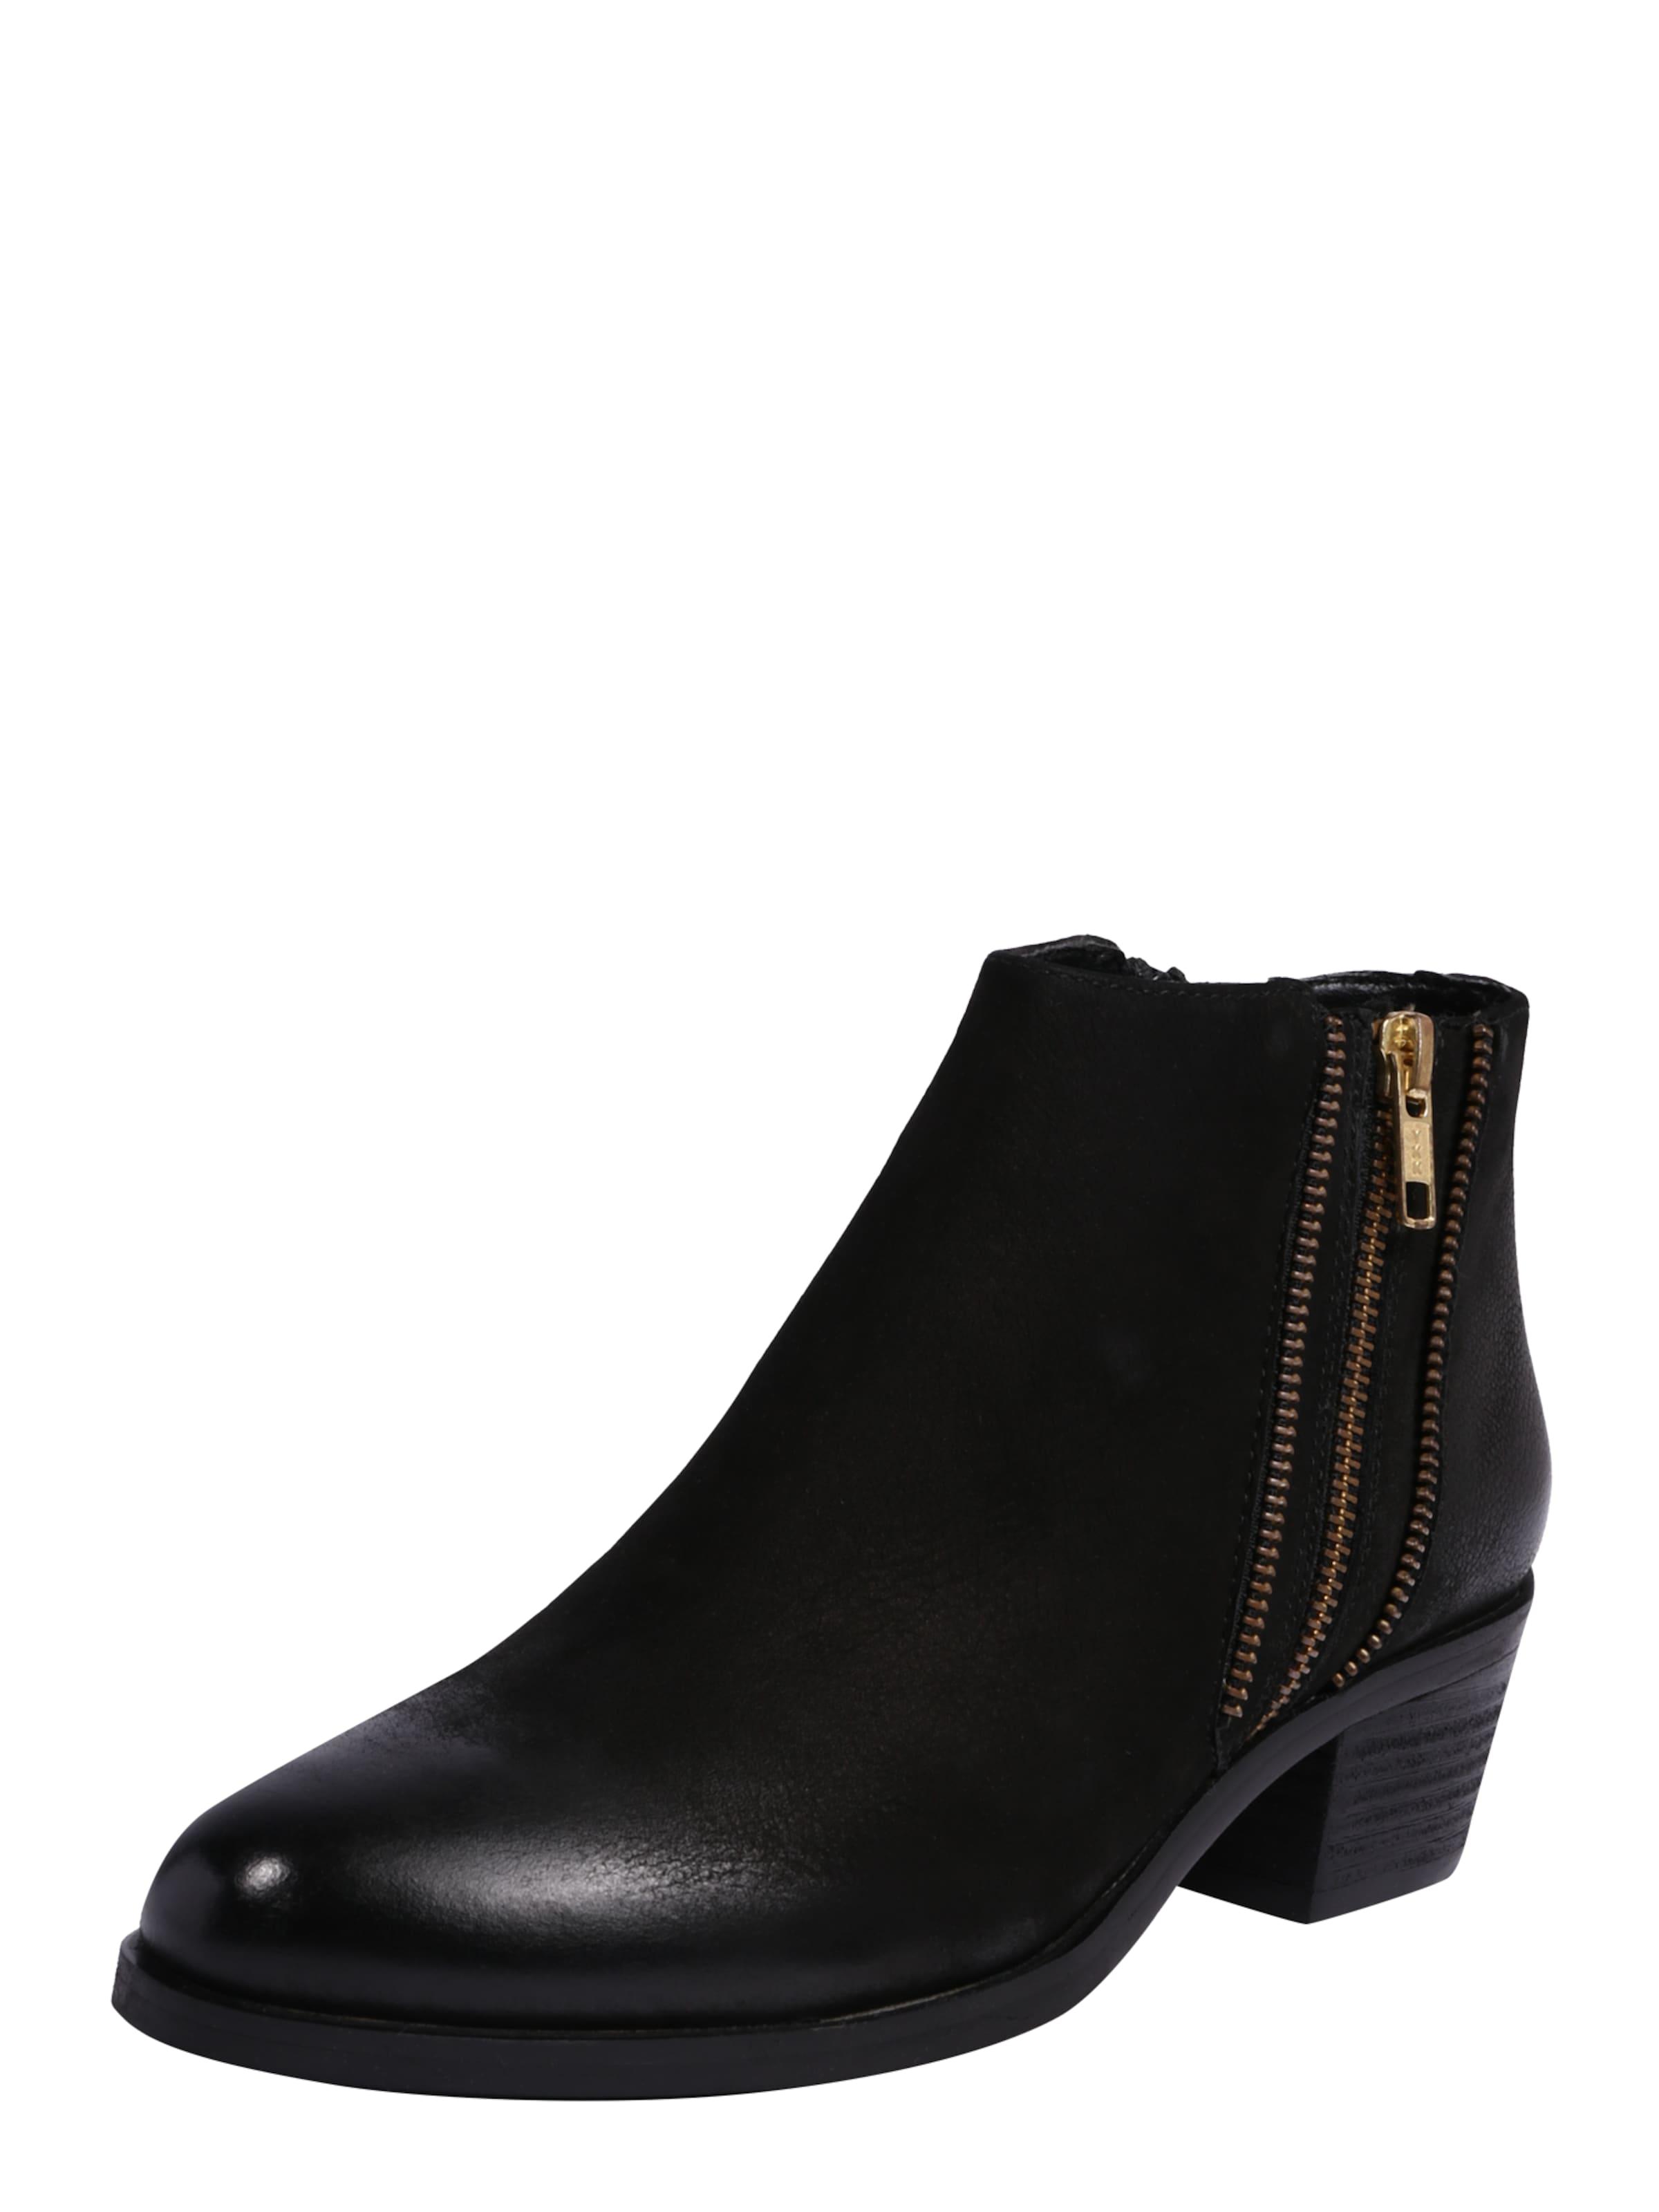 STEVE MADDEN Ankle Boots PALDEN Hohe Qualität